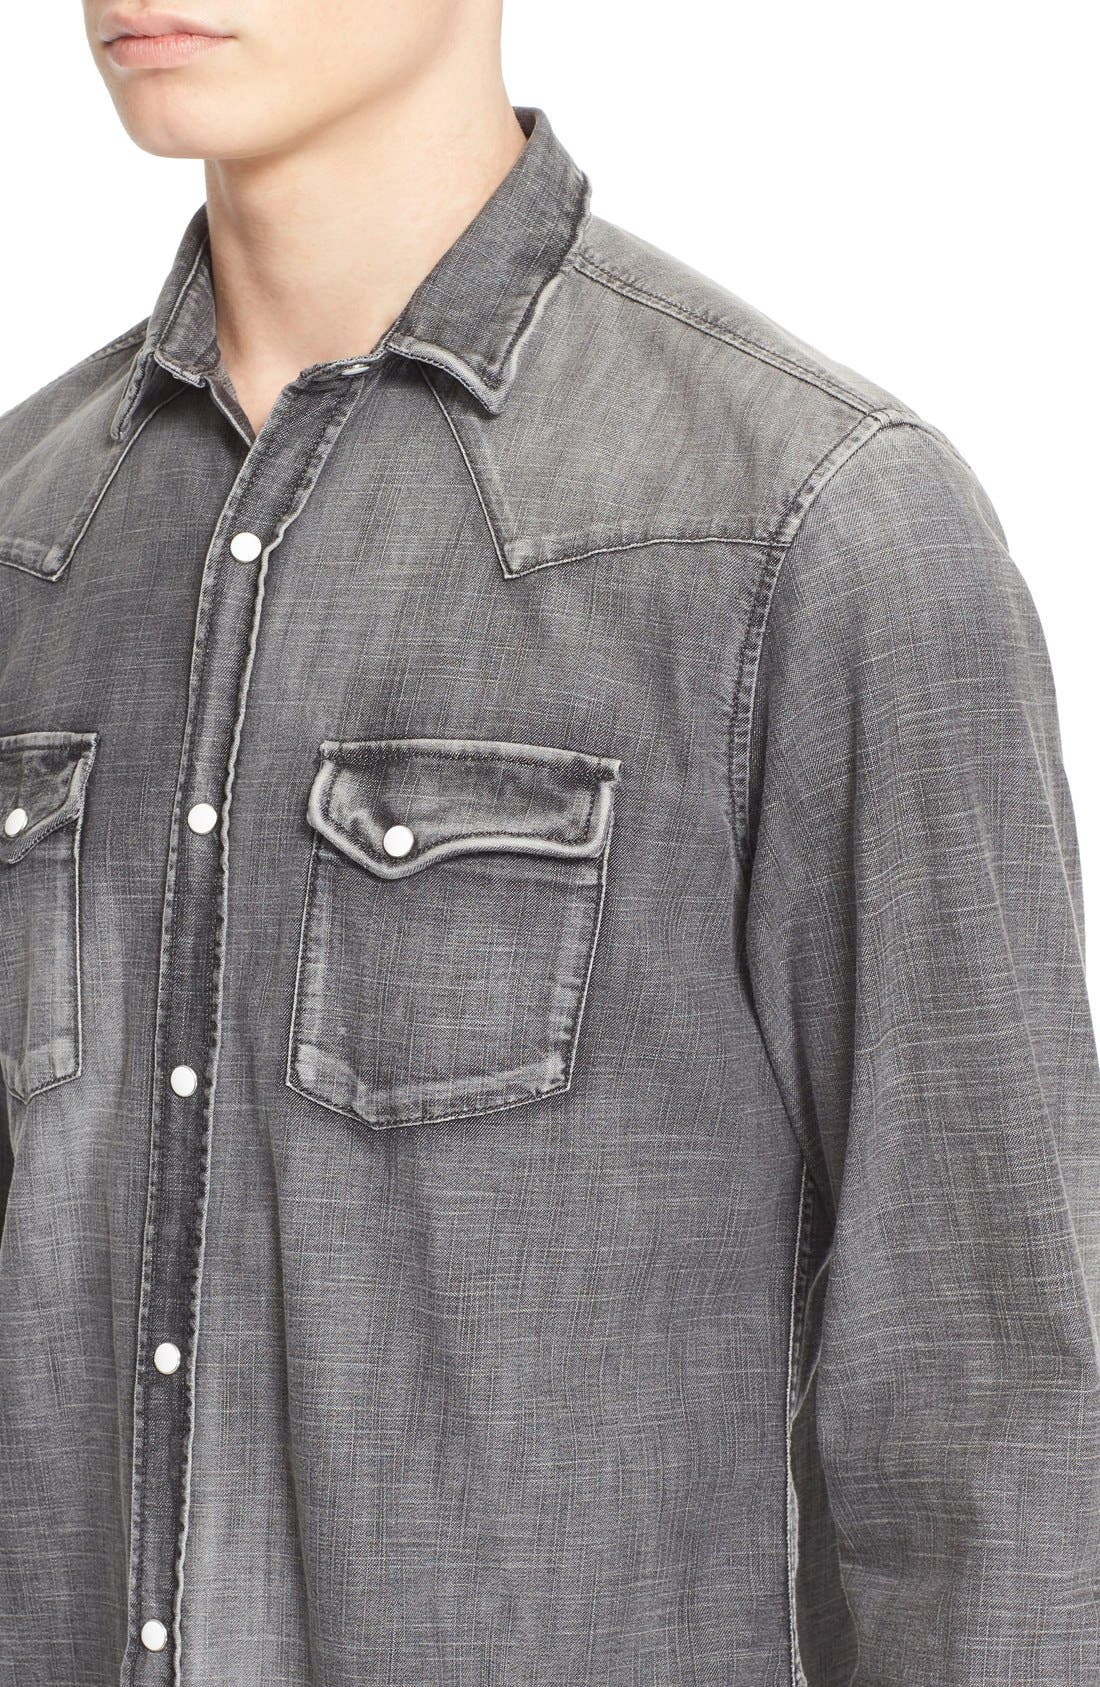 Trim Fit Denim Western Shirt,                             Alternate thumbnail 5, color,                             GREY